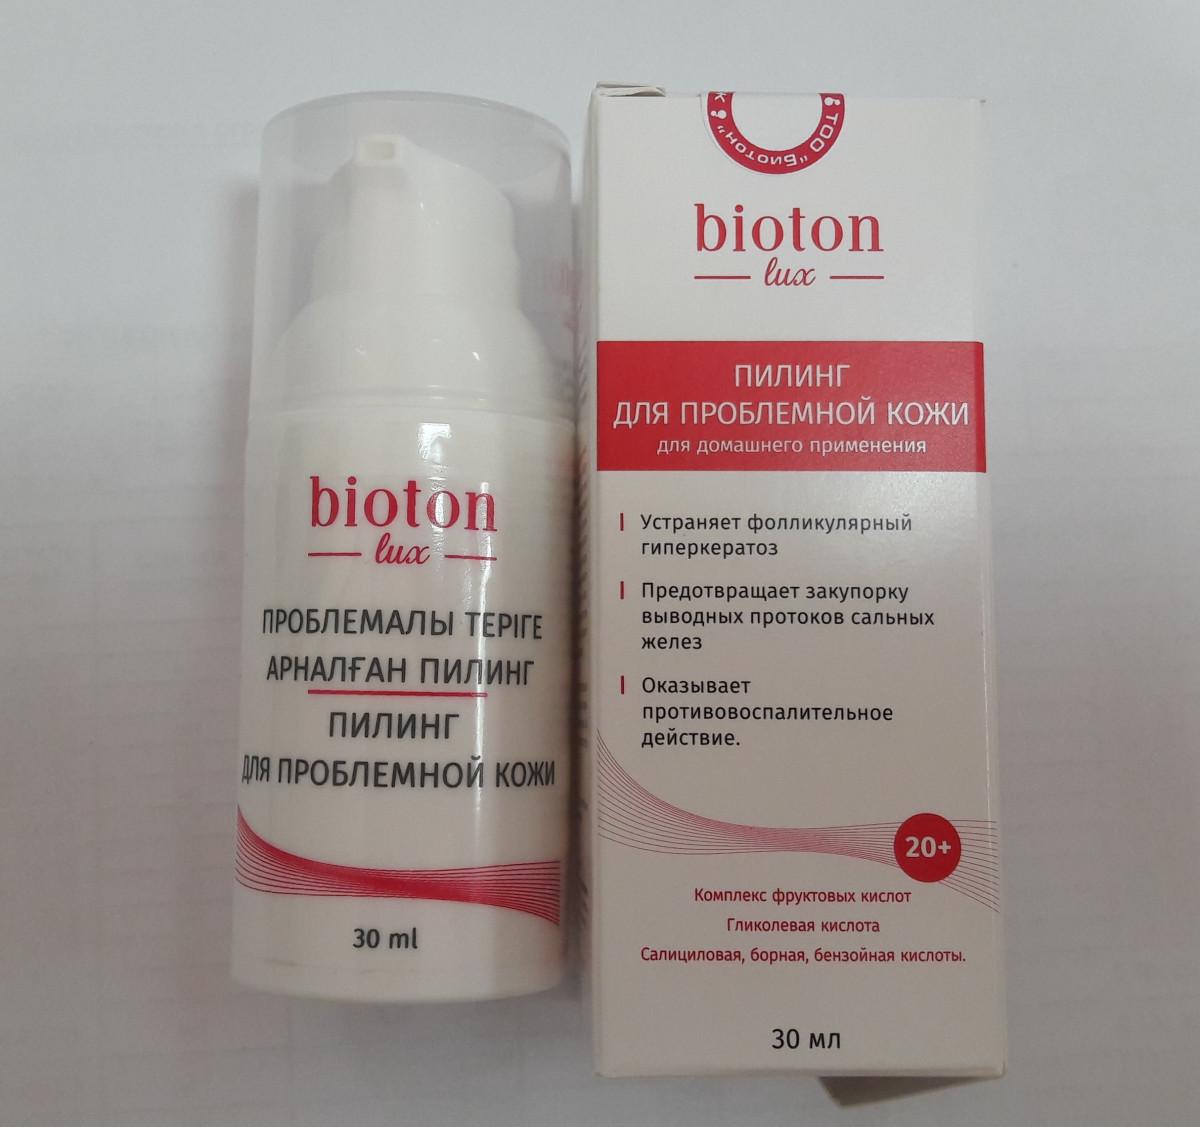 Пилинг «Для проблемной кожи» Bioton Lux